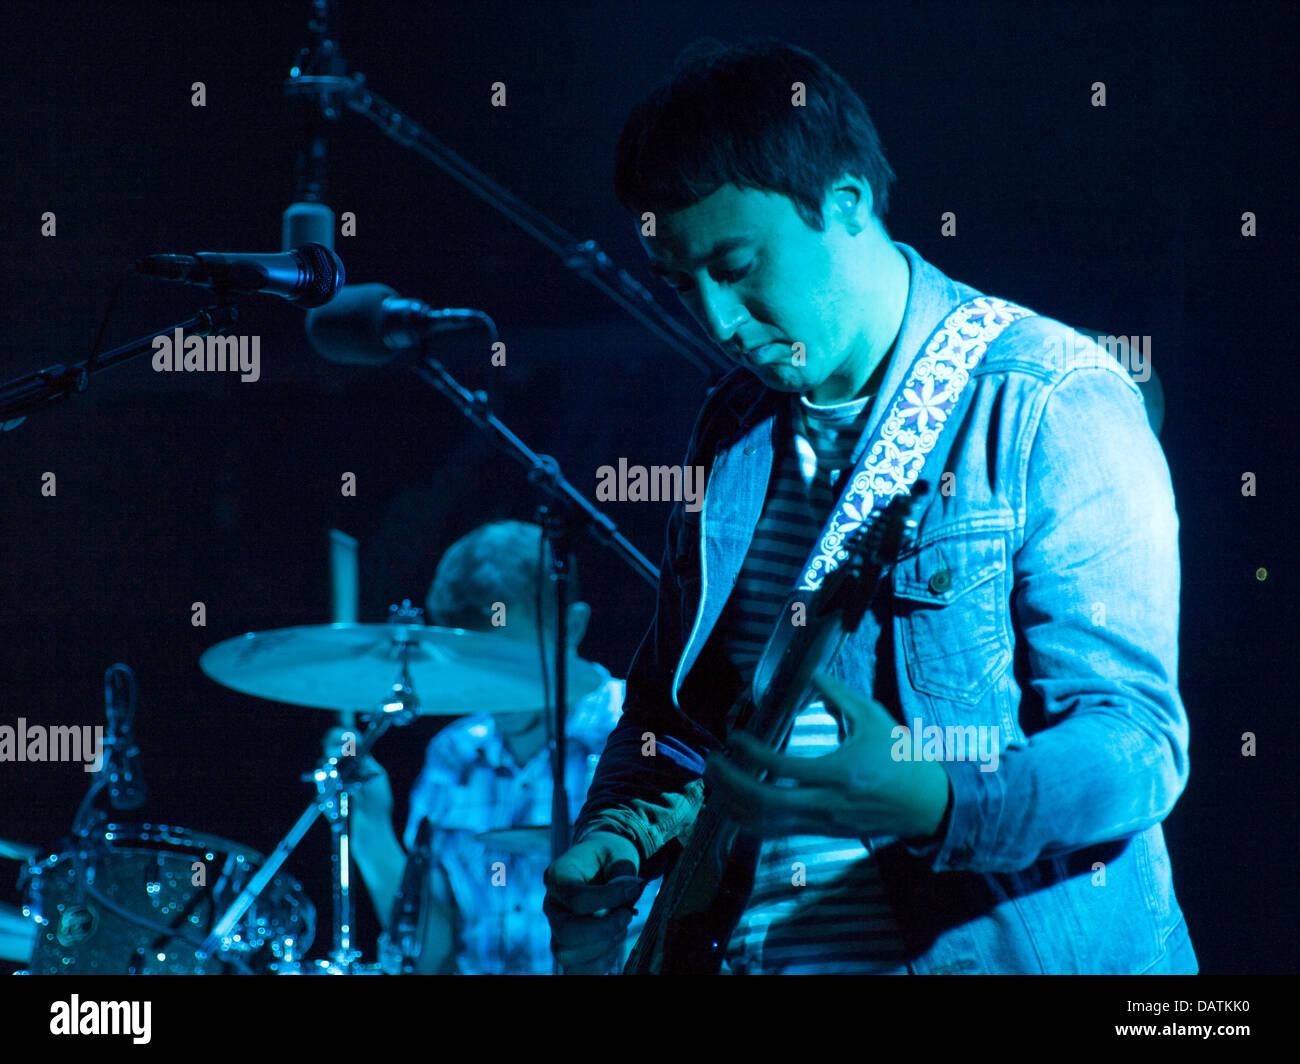 Oporto, Portugal, 18th July, Meo Mares Vivas - Music Festival, Palco Meo, american band The Smashing Pumpkins, Jeff - Stock Image